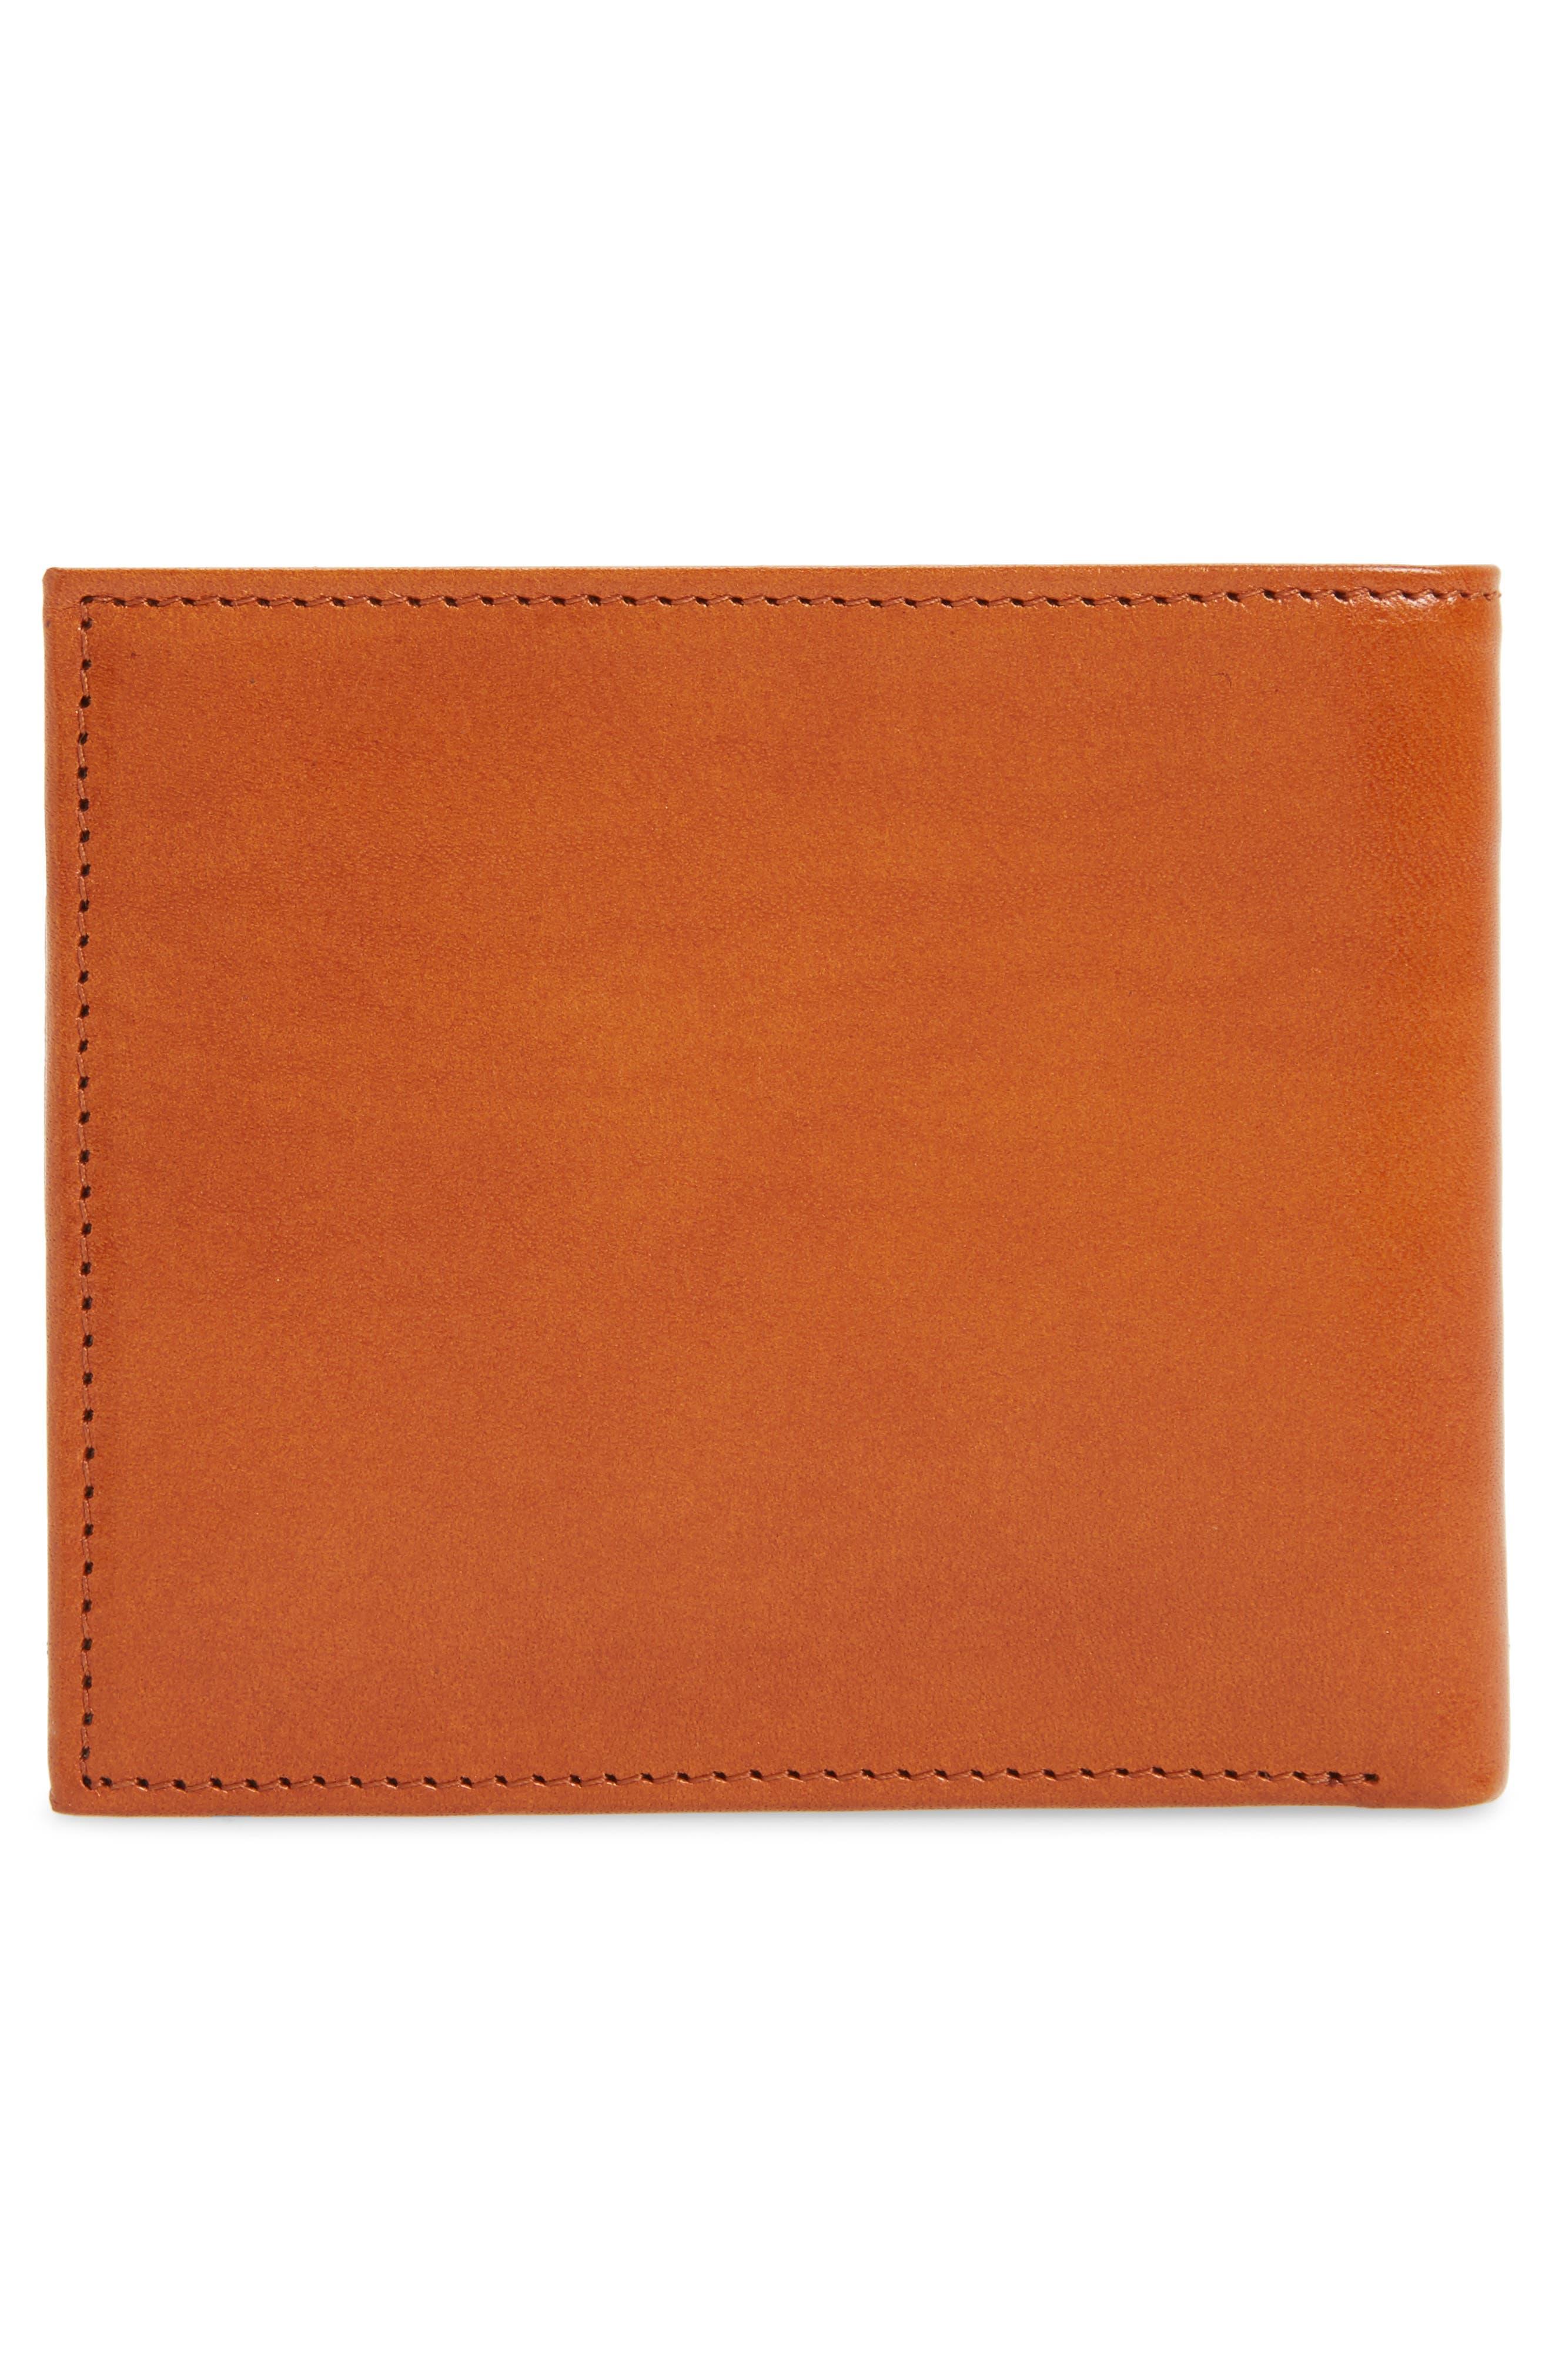 Vivid Leather Wallet,                             Alternate thumbnail 3, color,                             217